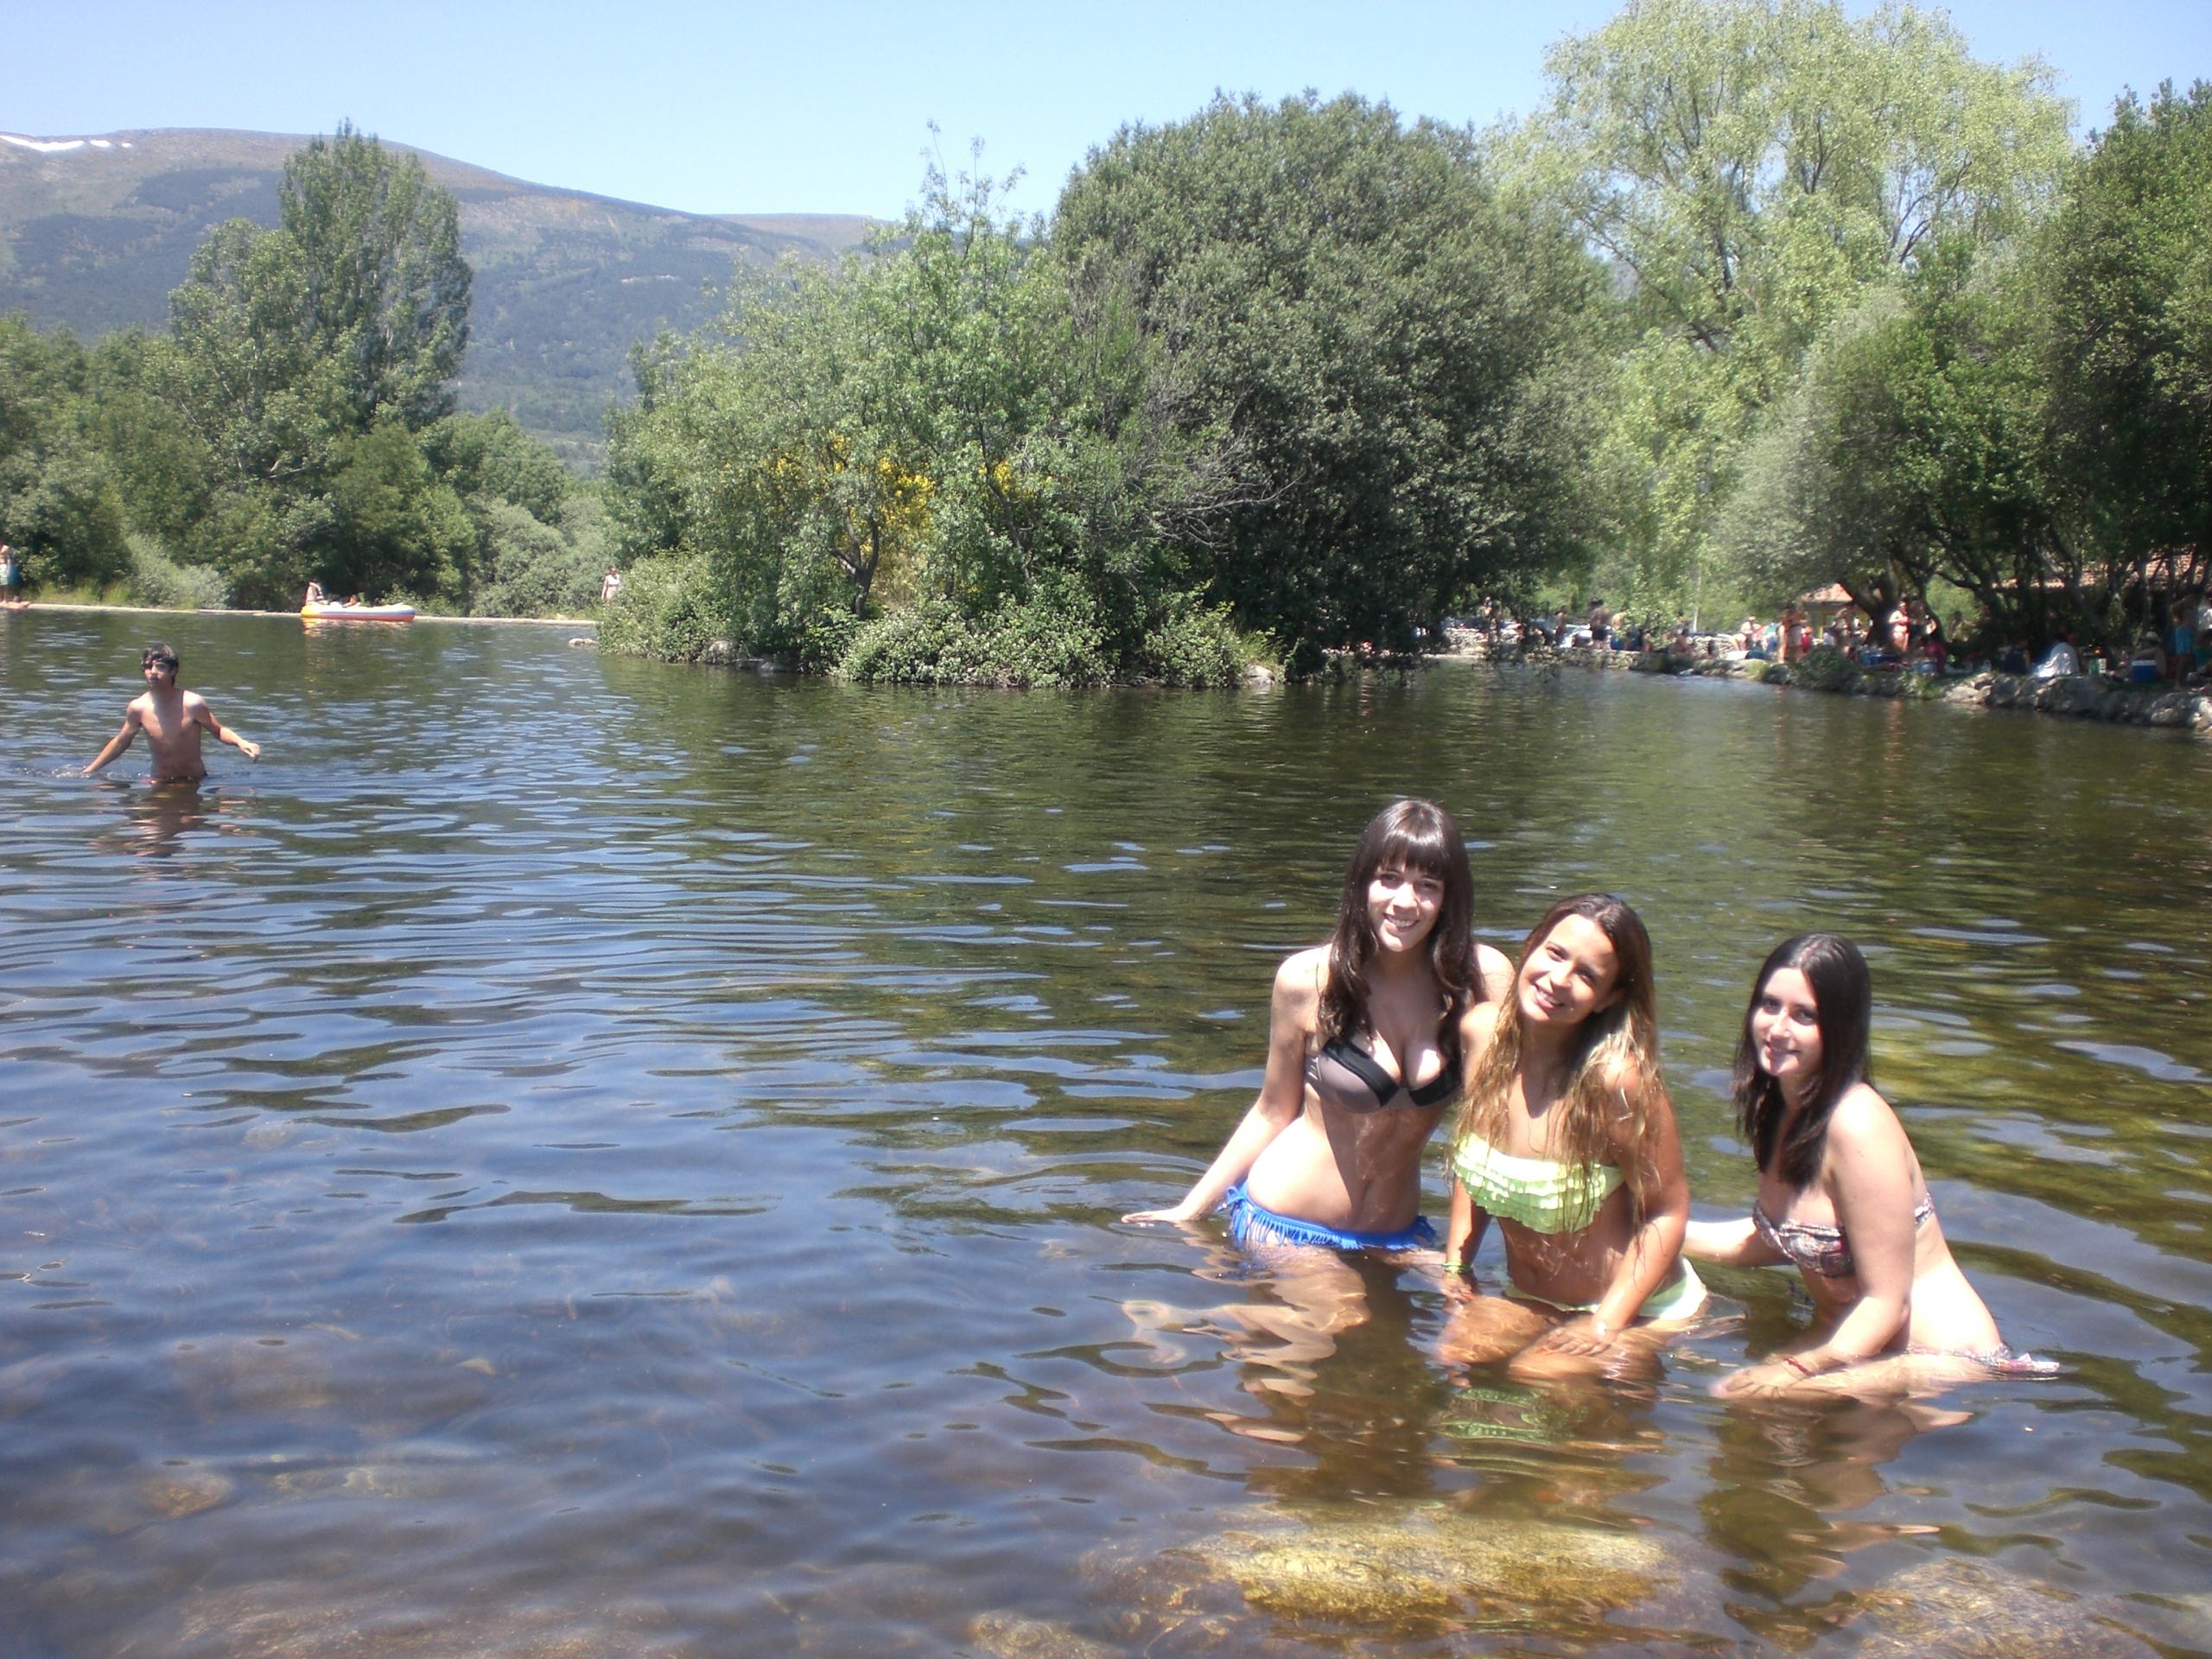 Piscinas naturales en rascafr a madrid natural pools in for Piscinas naturales cerca de madrid